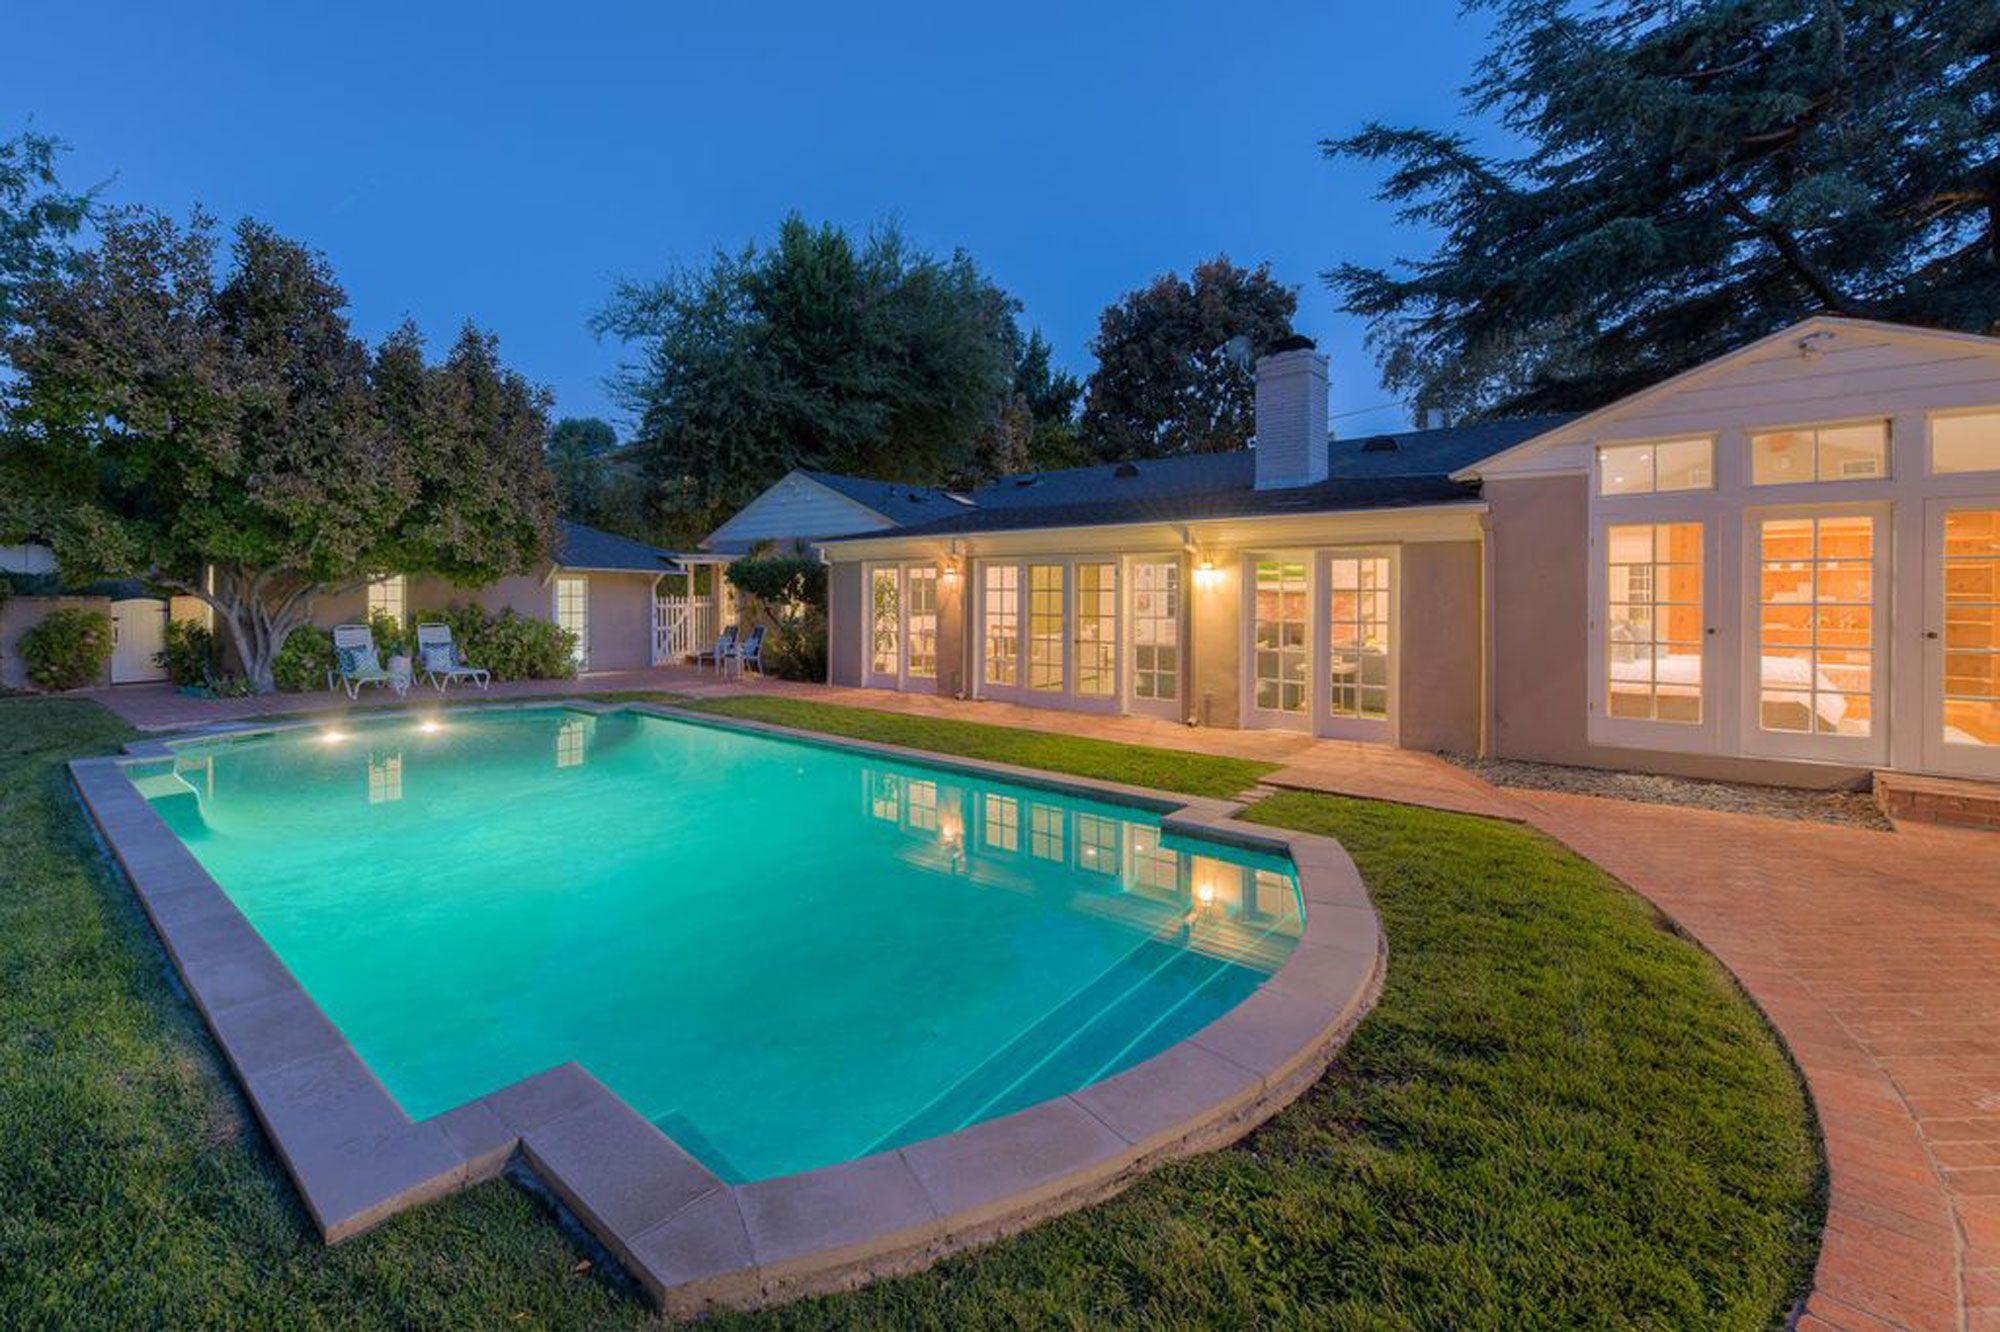 Apres Sa Maison A Malibu Leonardo Dicaprio Vend Son Ranch En